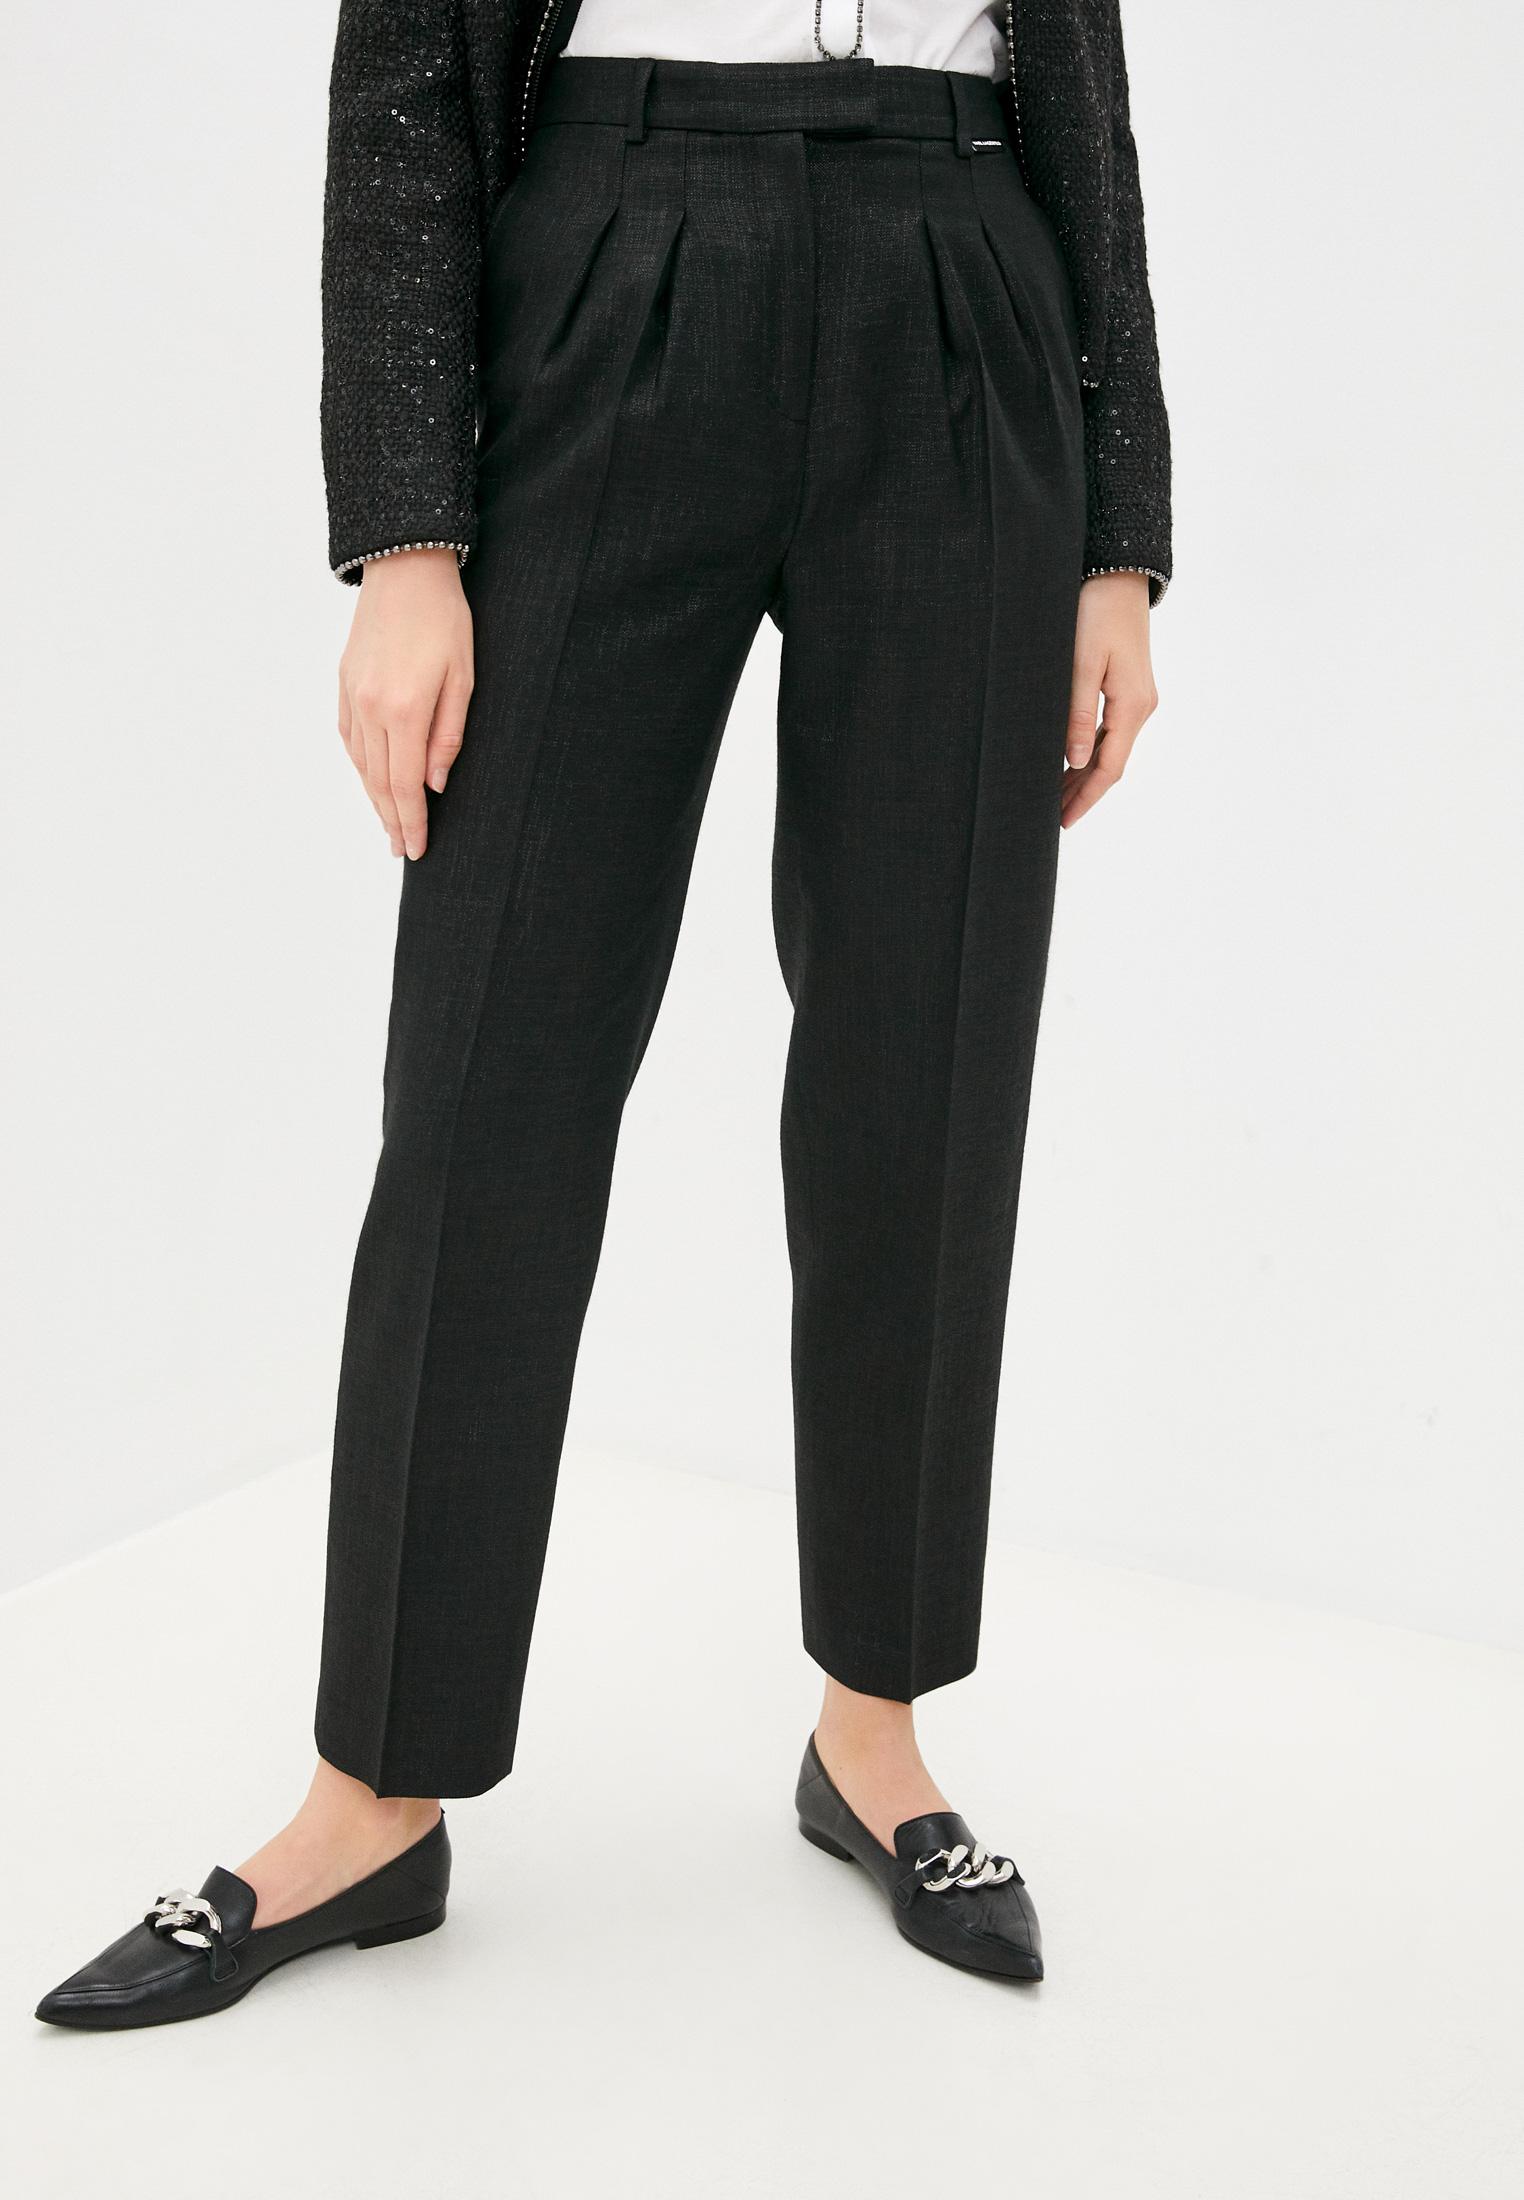 Женские классические брюки Karl Lagerfeld 216W1093